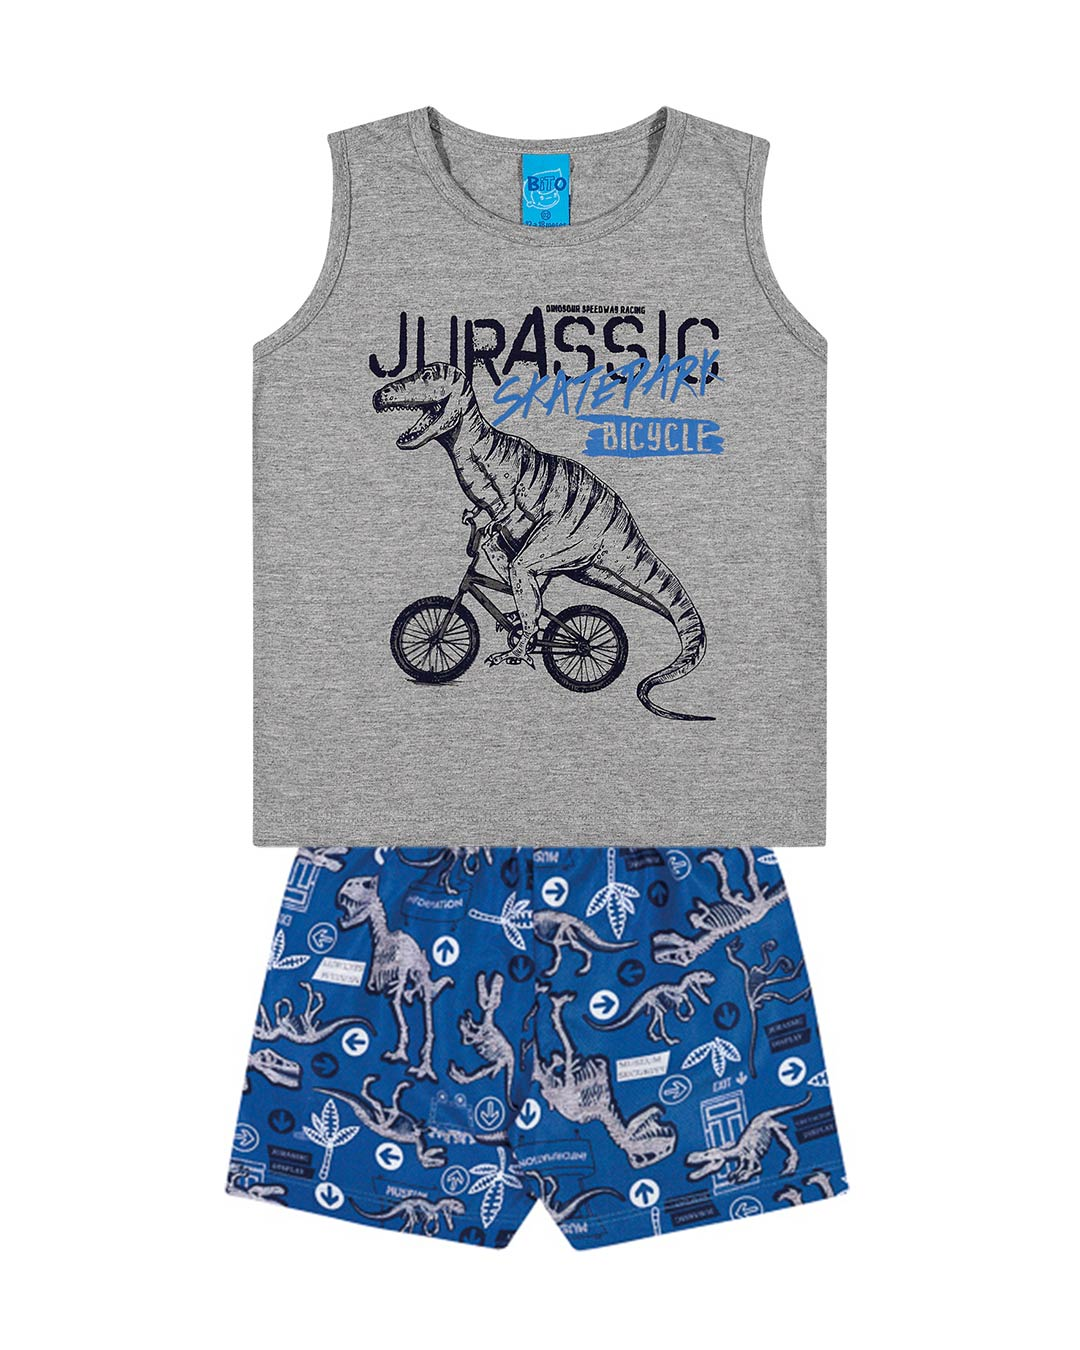 Conjunto Infantil Regata Jurassic Bicycle - Lecimar